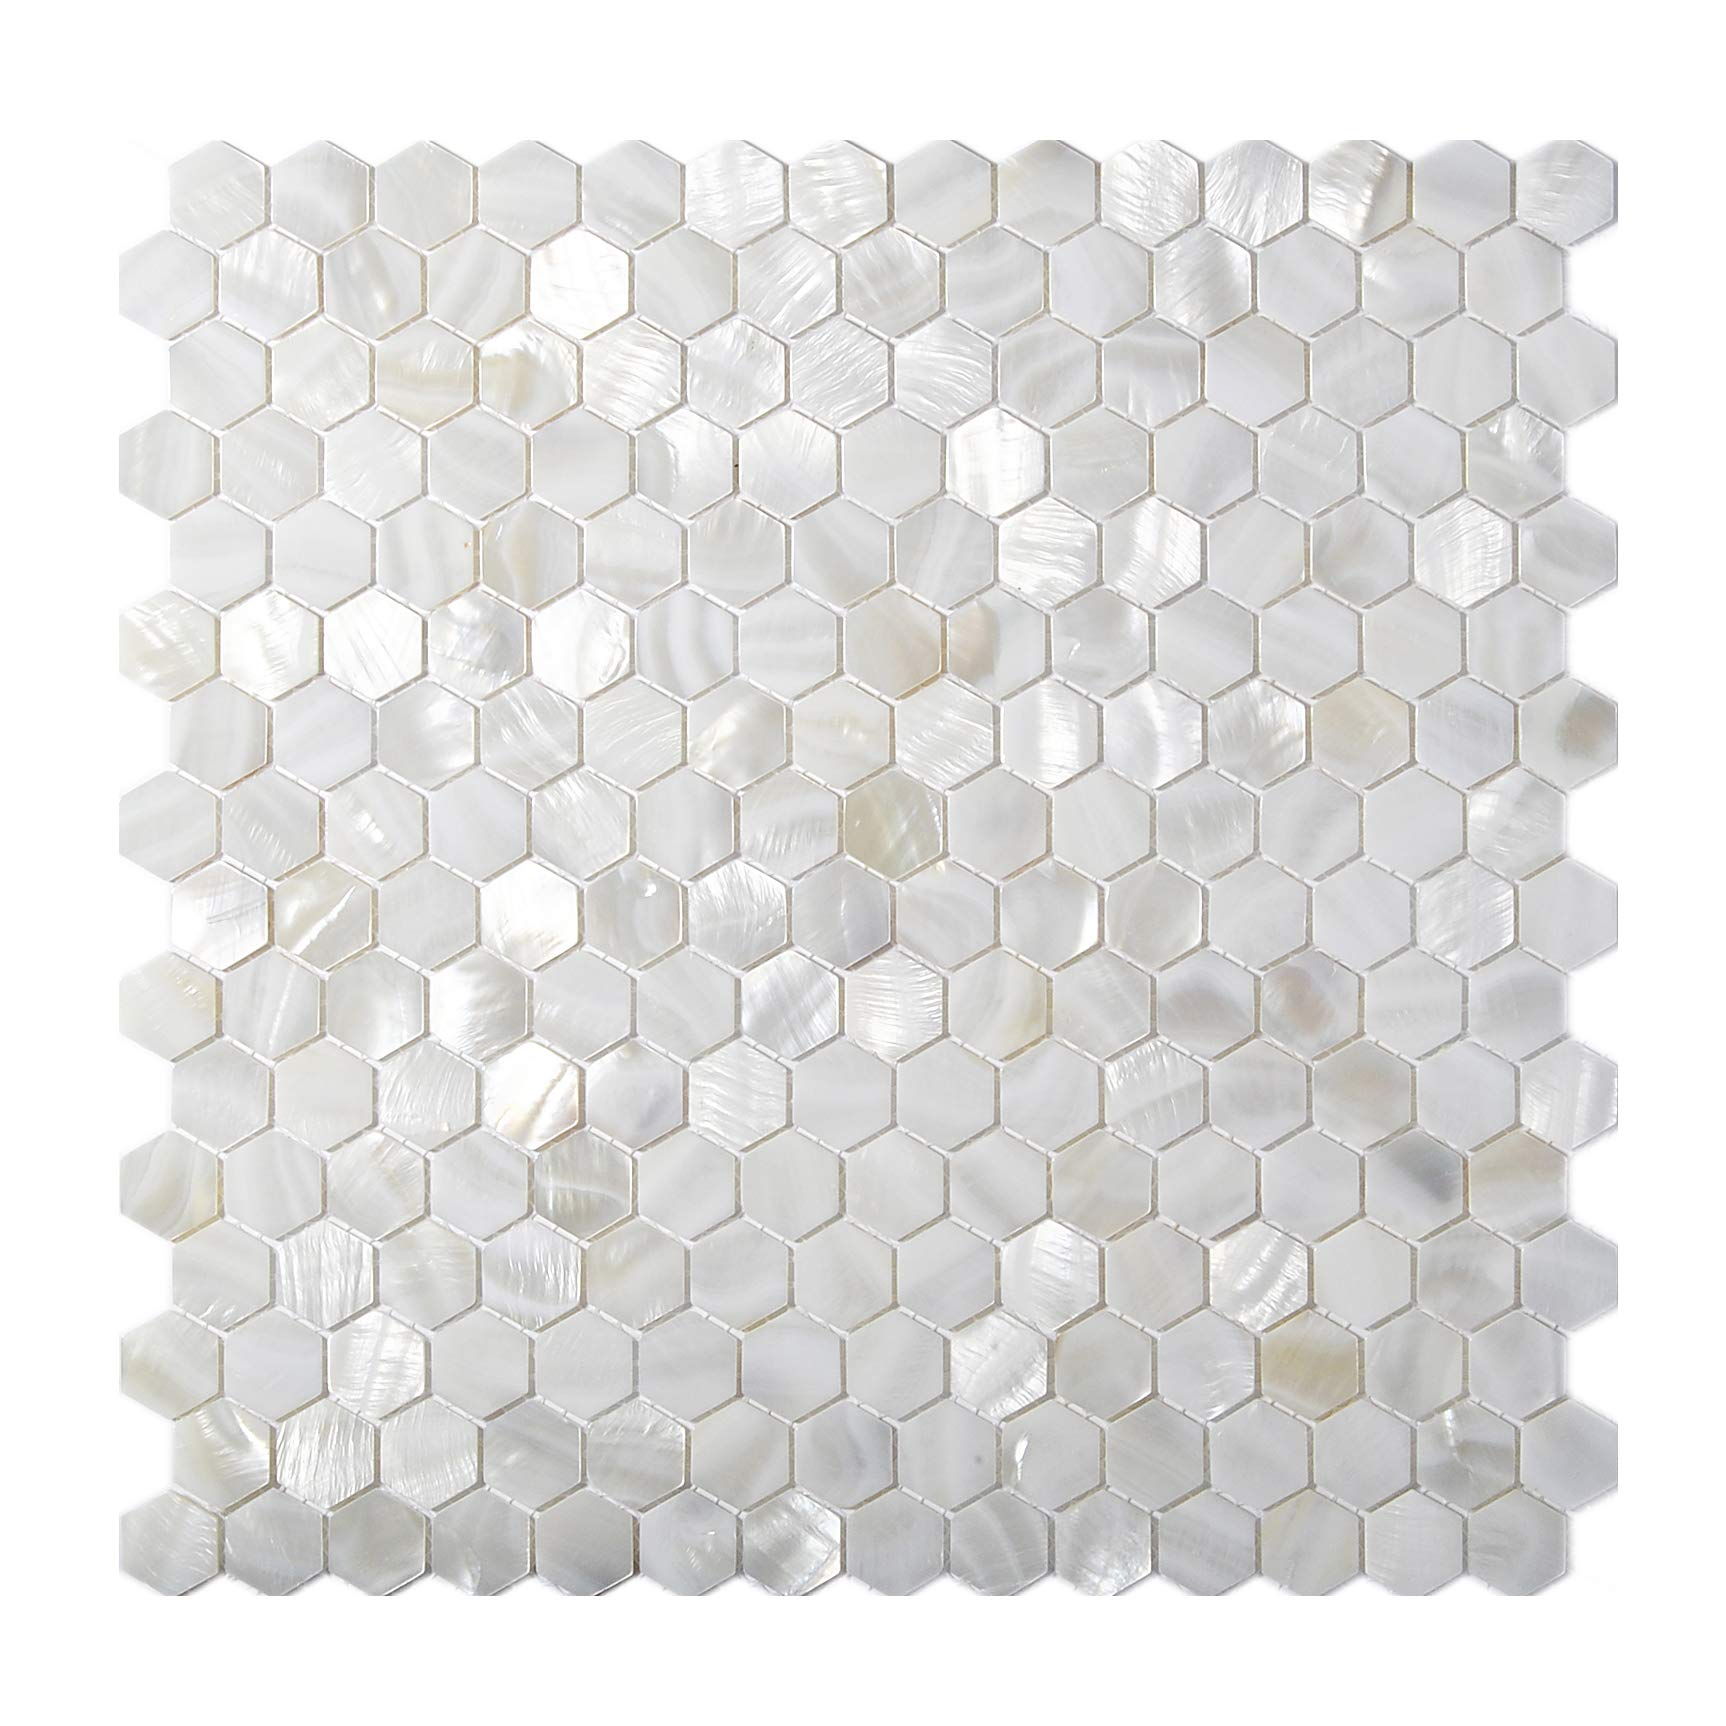 TST Mother of Pearl Tiles White Hexagon Shinning Wall Deco Backsplash Shell Tile MOP04 (5 Square Feet)